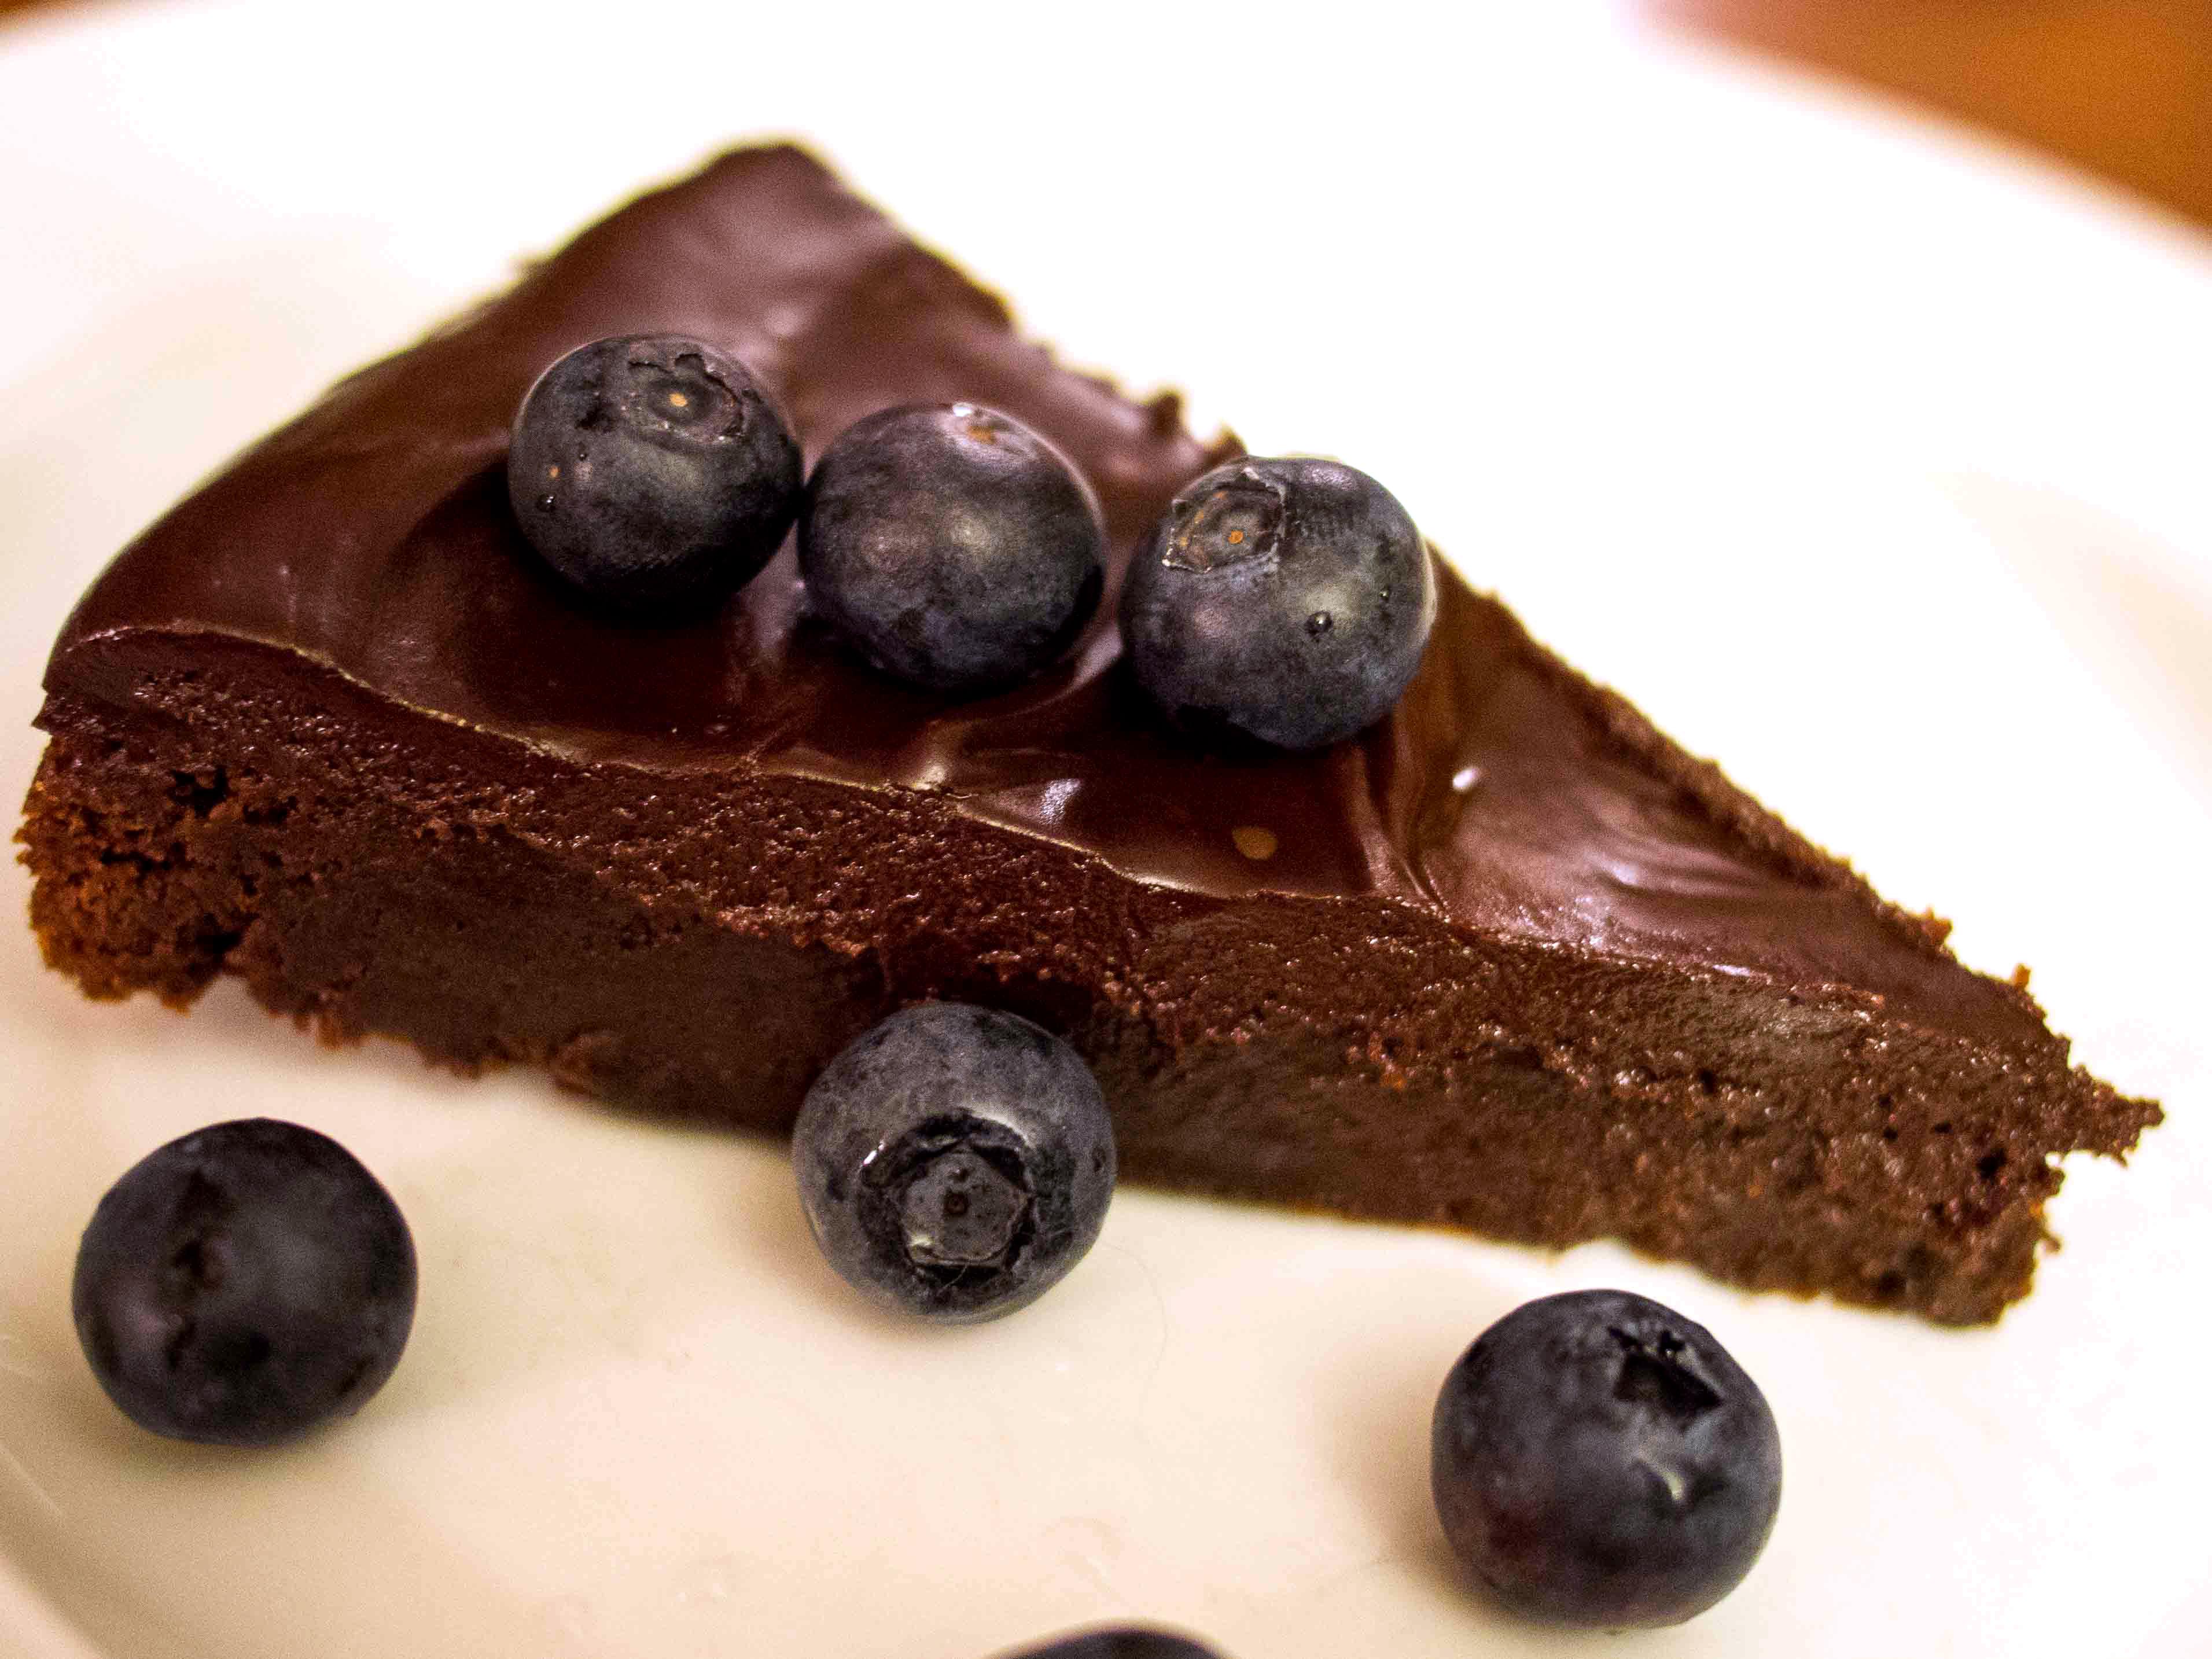 Flourless Chocolate Cake with Chocolate Ganache - Food & Fire